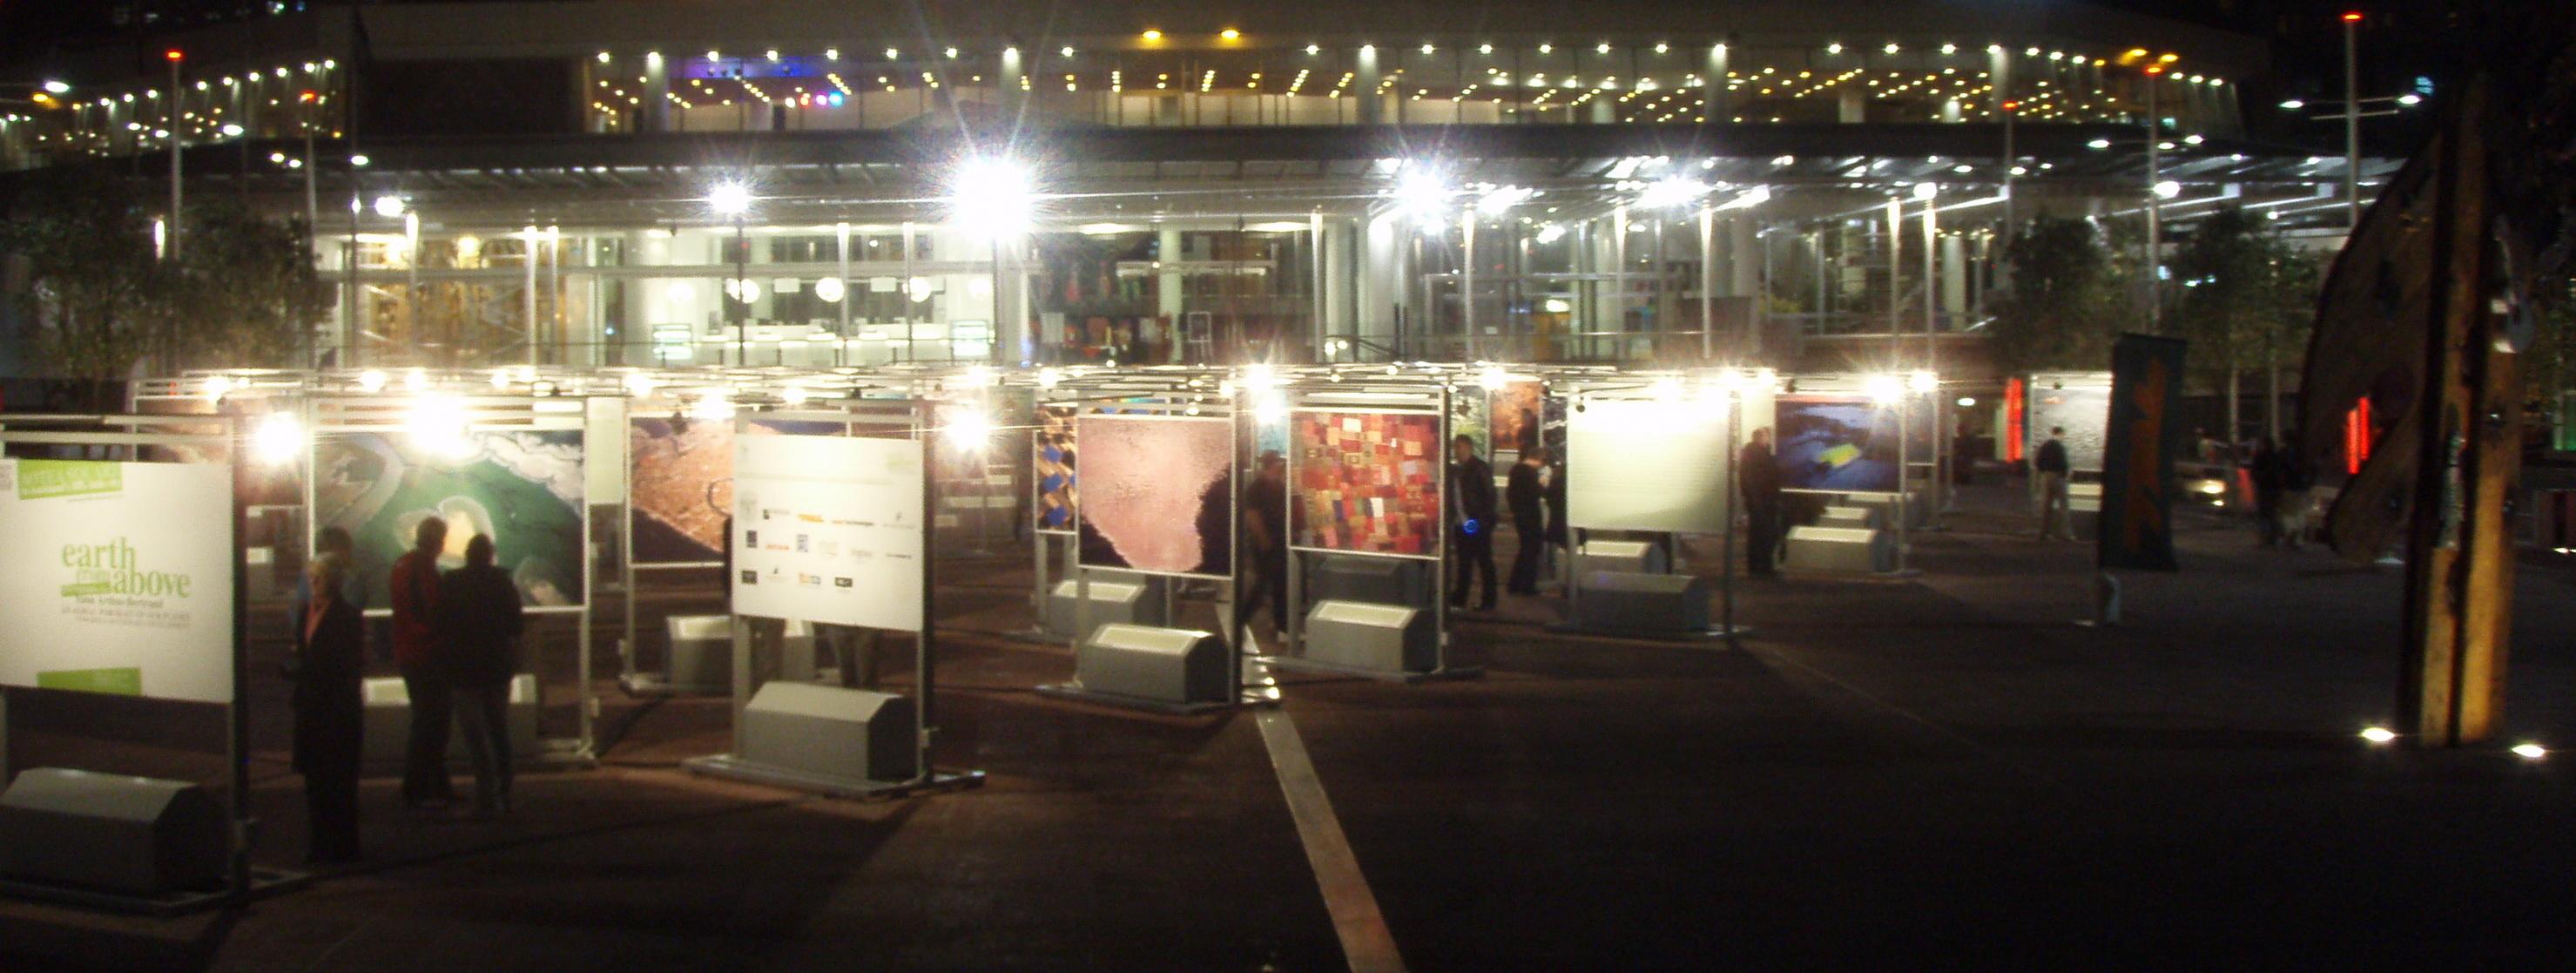 143_Exhibition.jpg